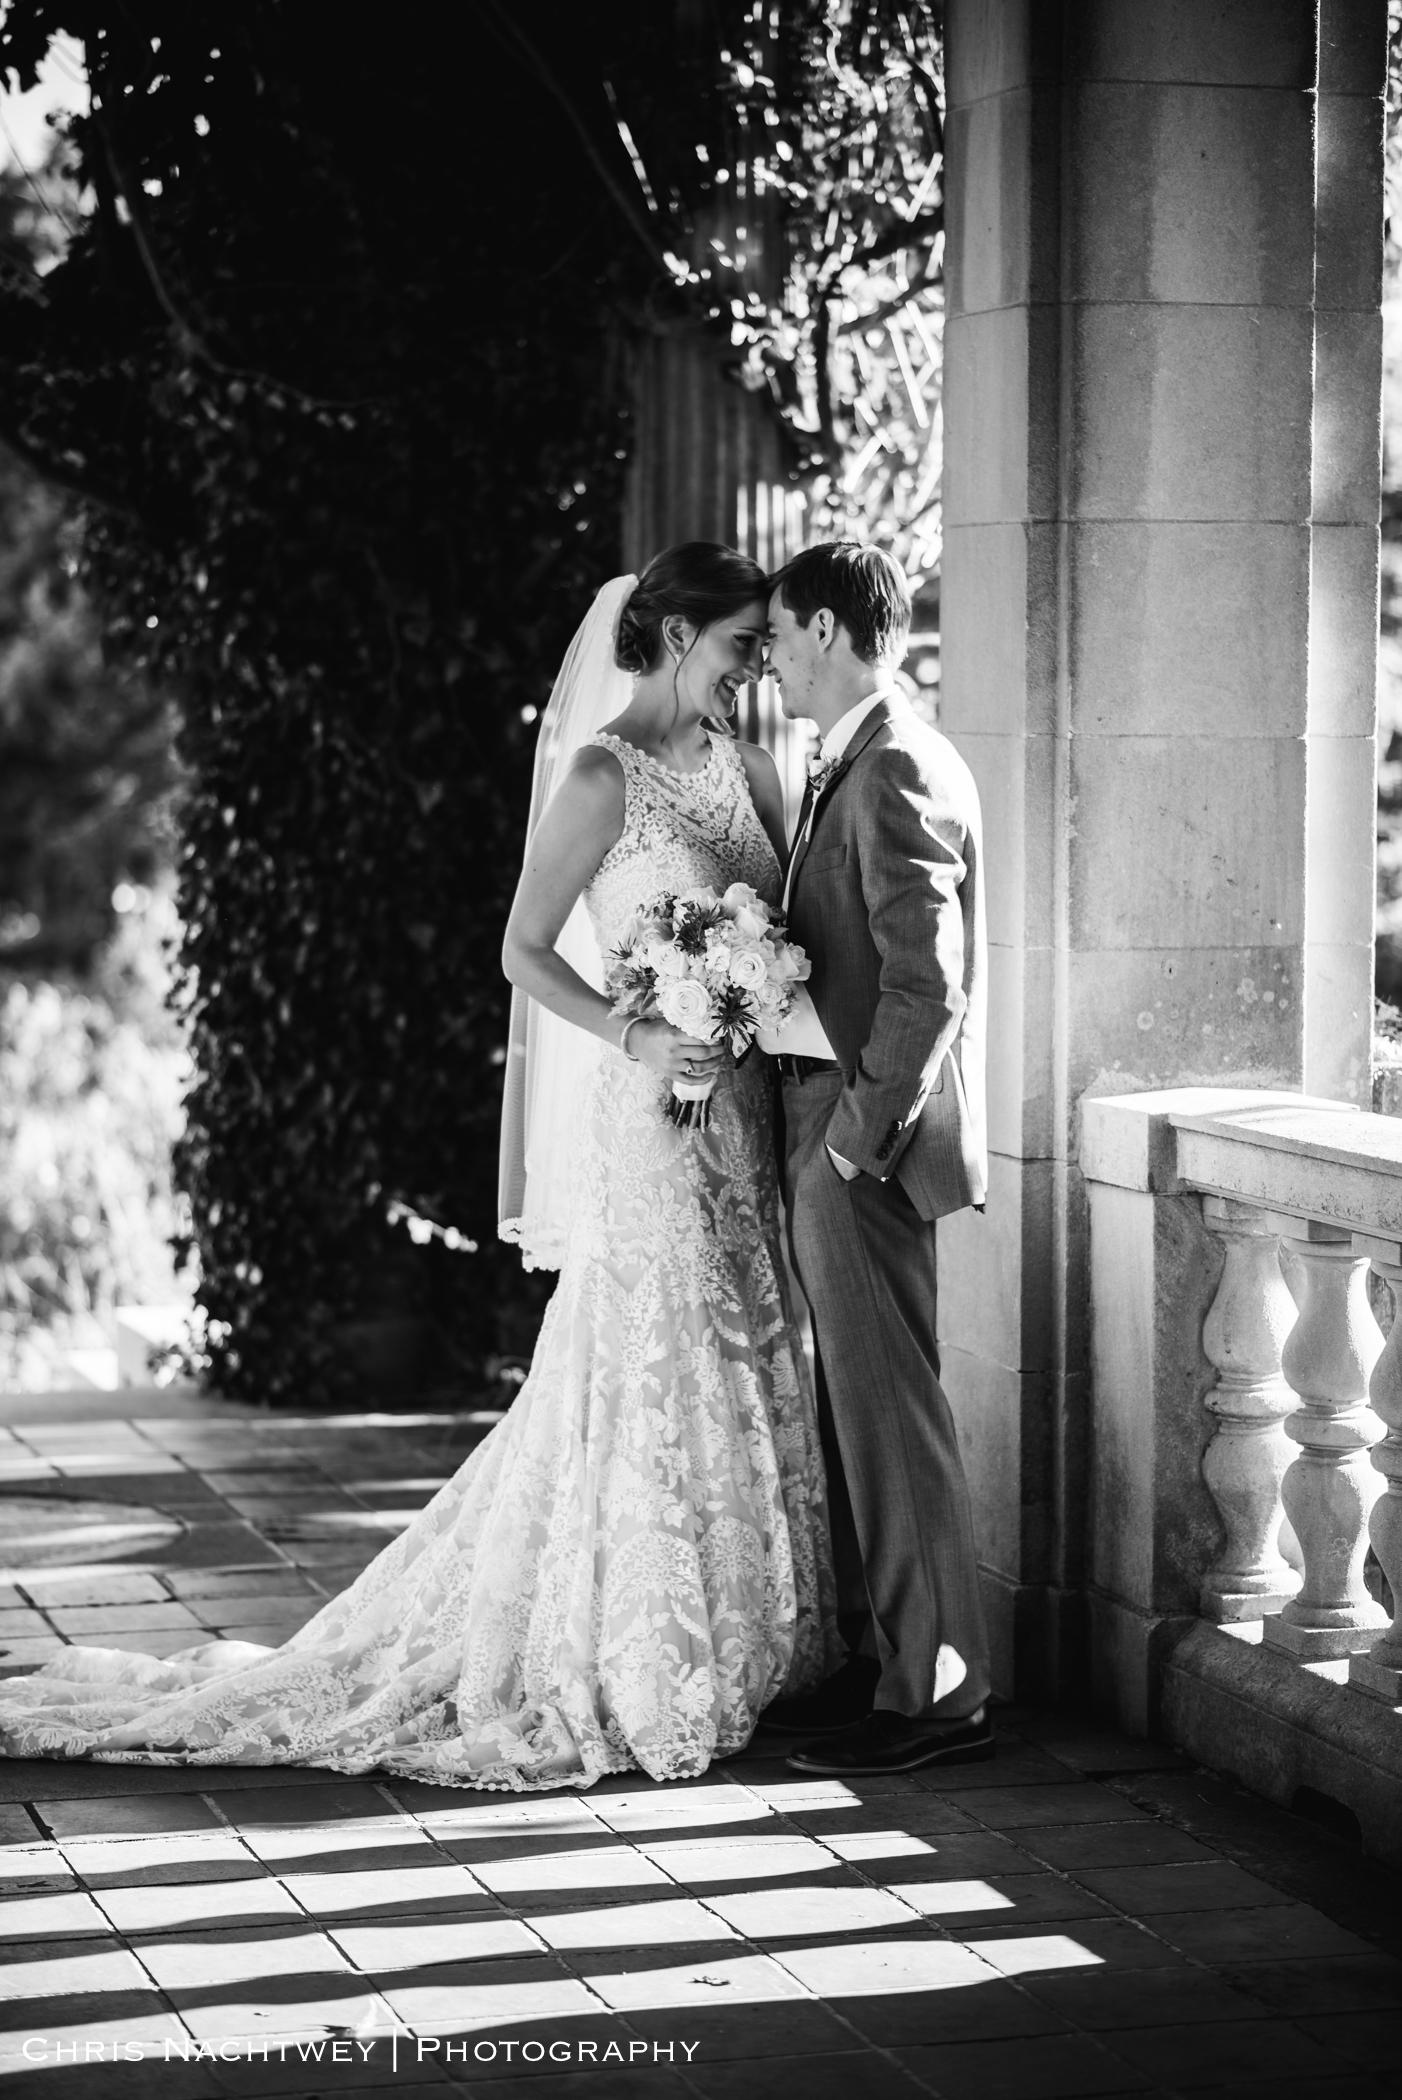 harkness-wedding-photos-chris-nachtwey-photography-2018-21.jpg